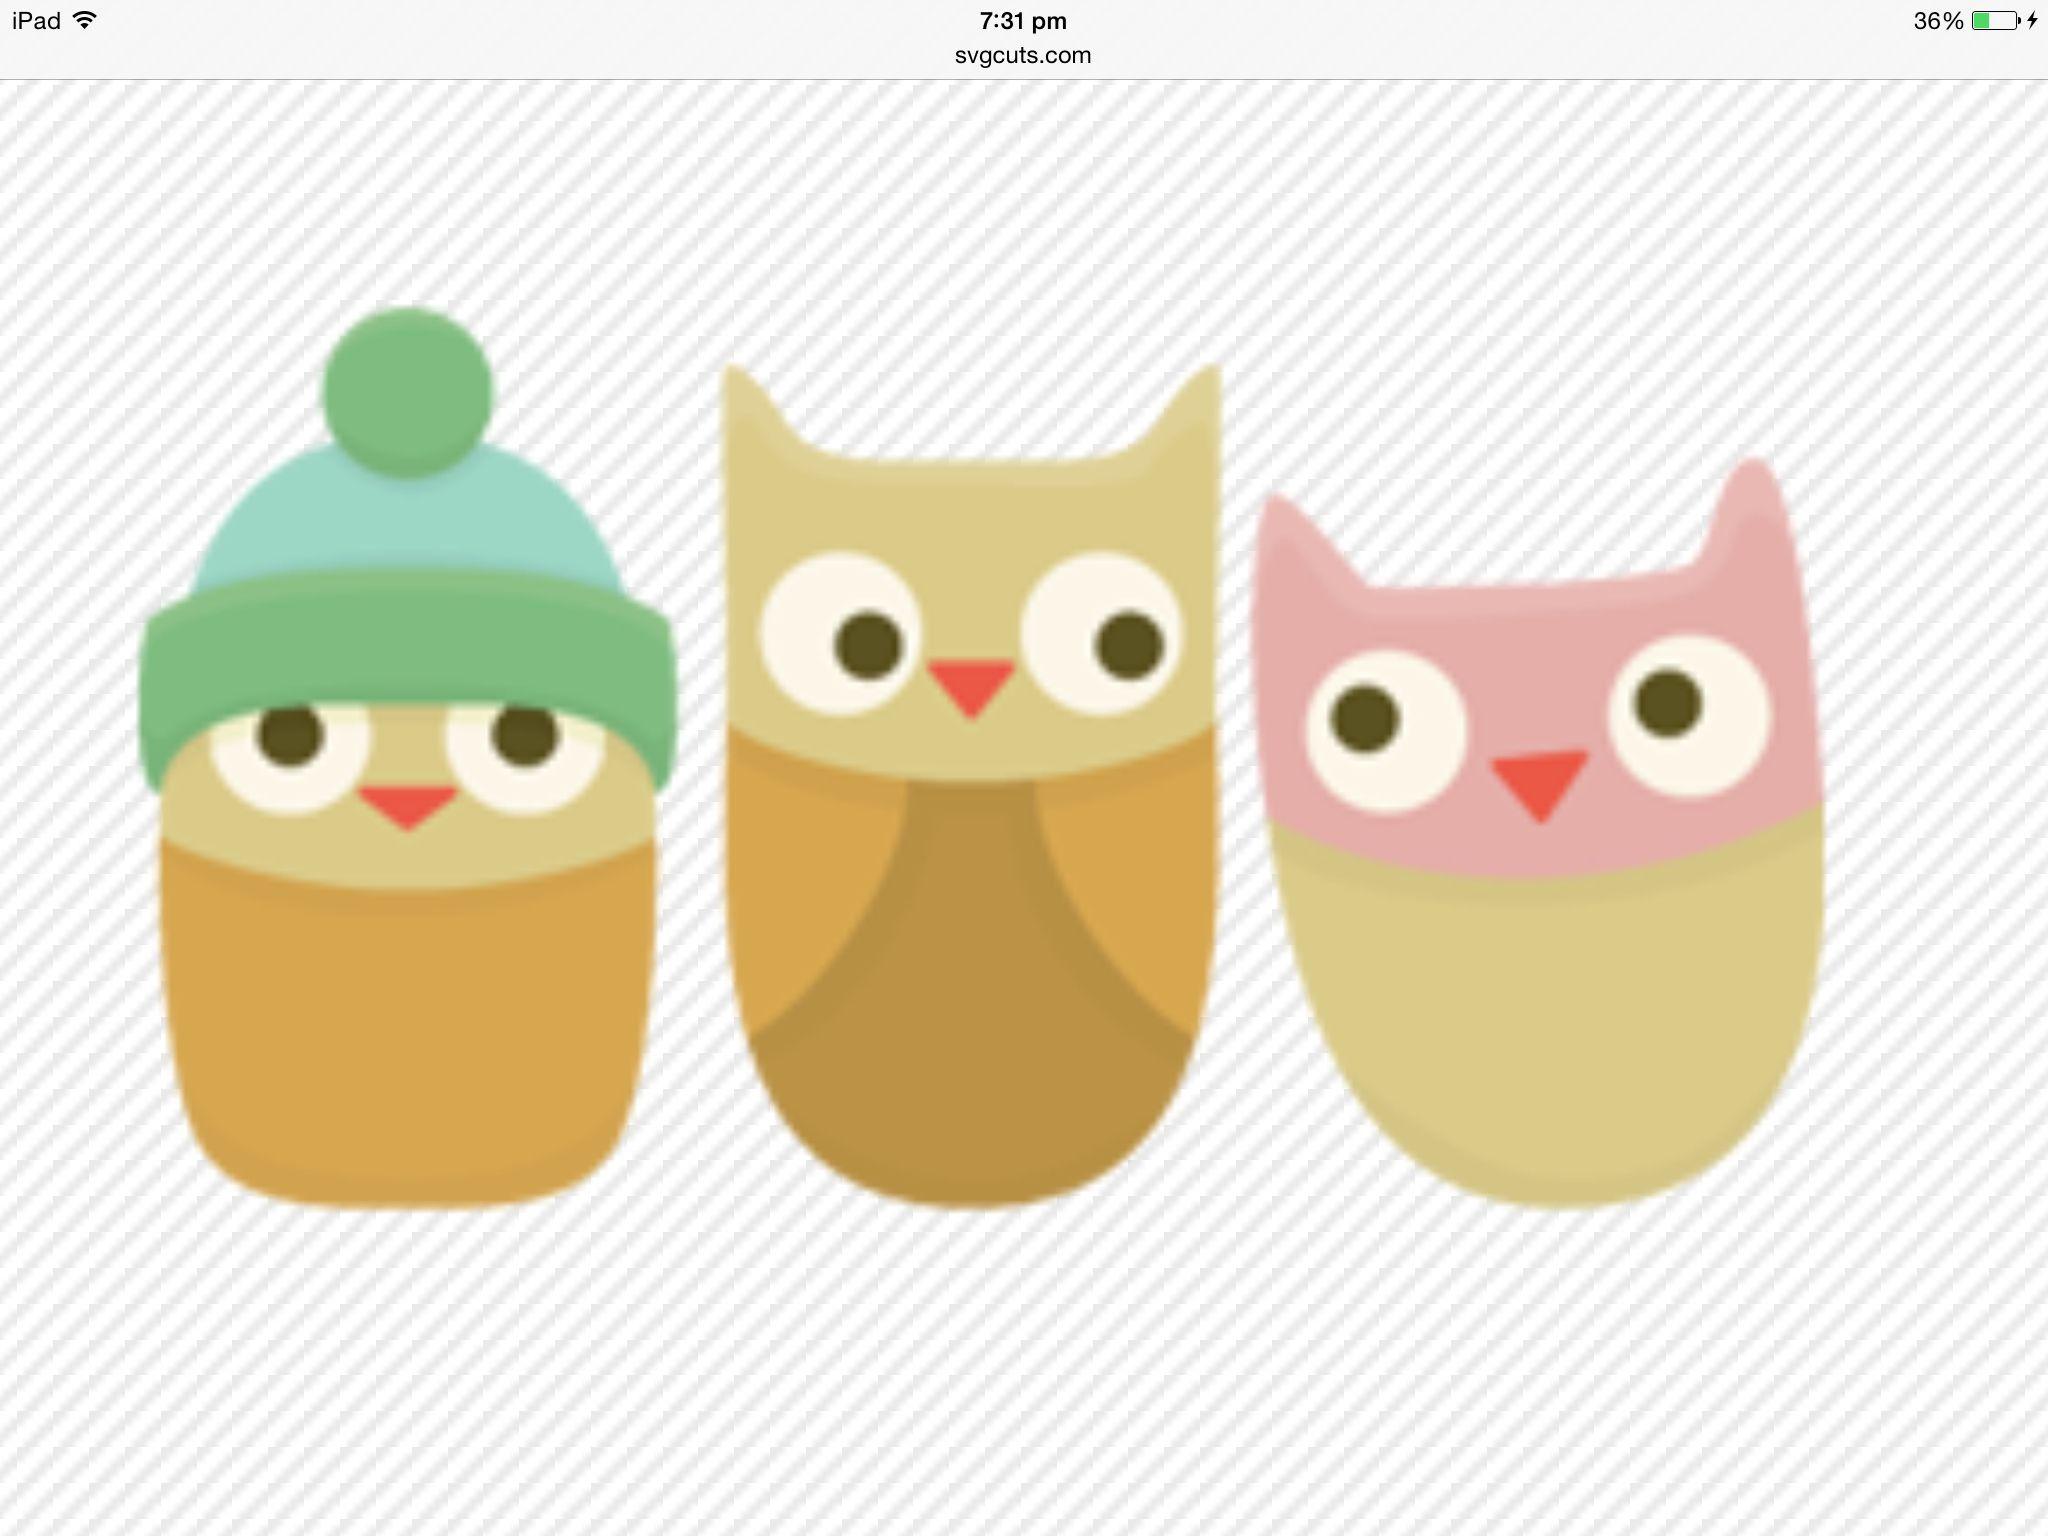 SVG Owls | Learning | Pinterest | Owl